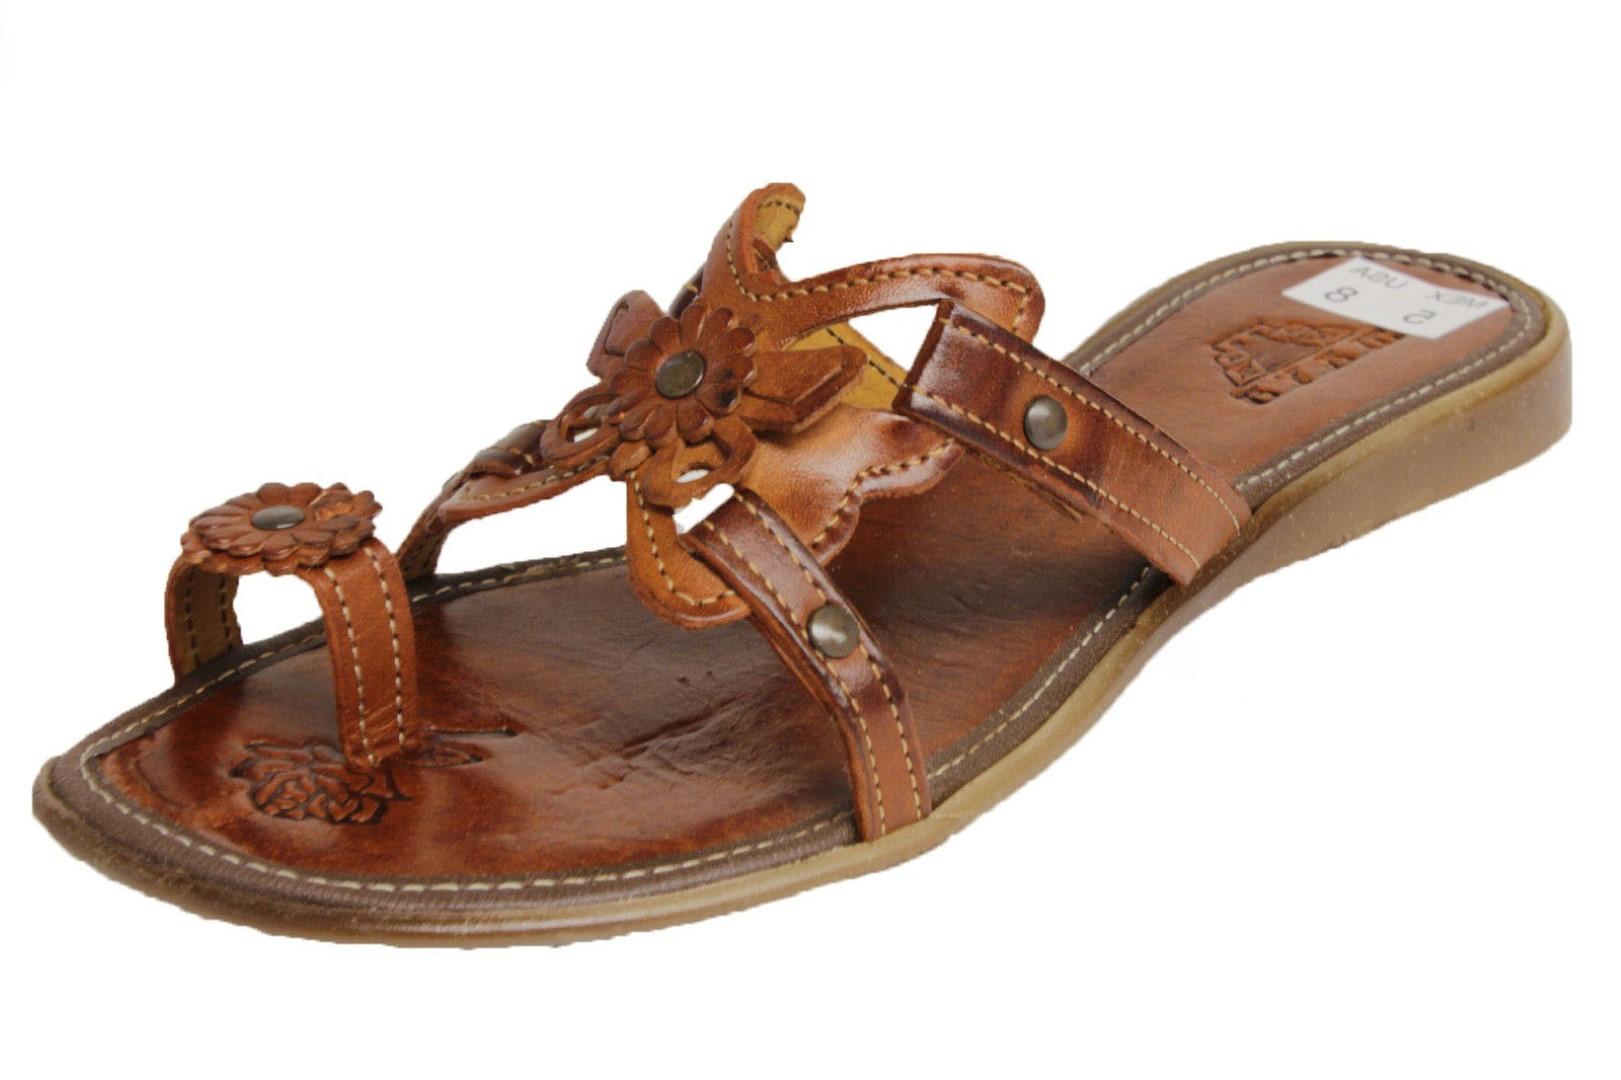 4c0c69c3deab3 Womens Genuine Leather Cognac Boho Slip On Sandals Butterfly Flower ...